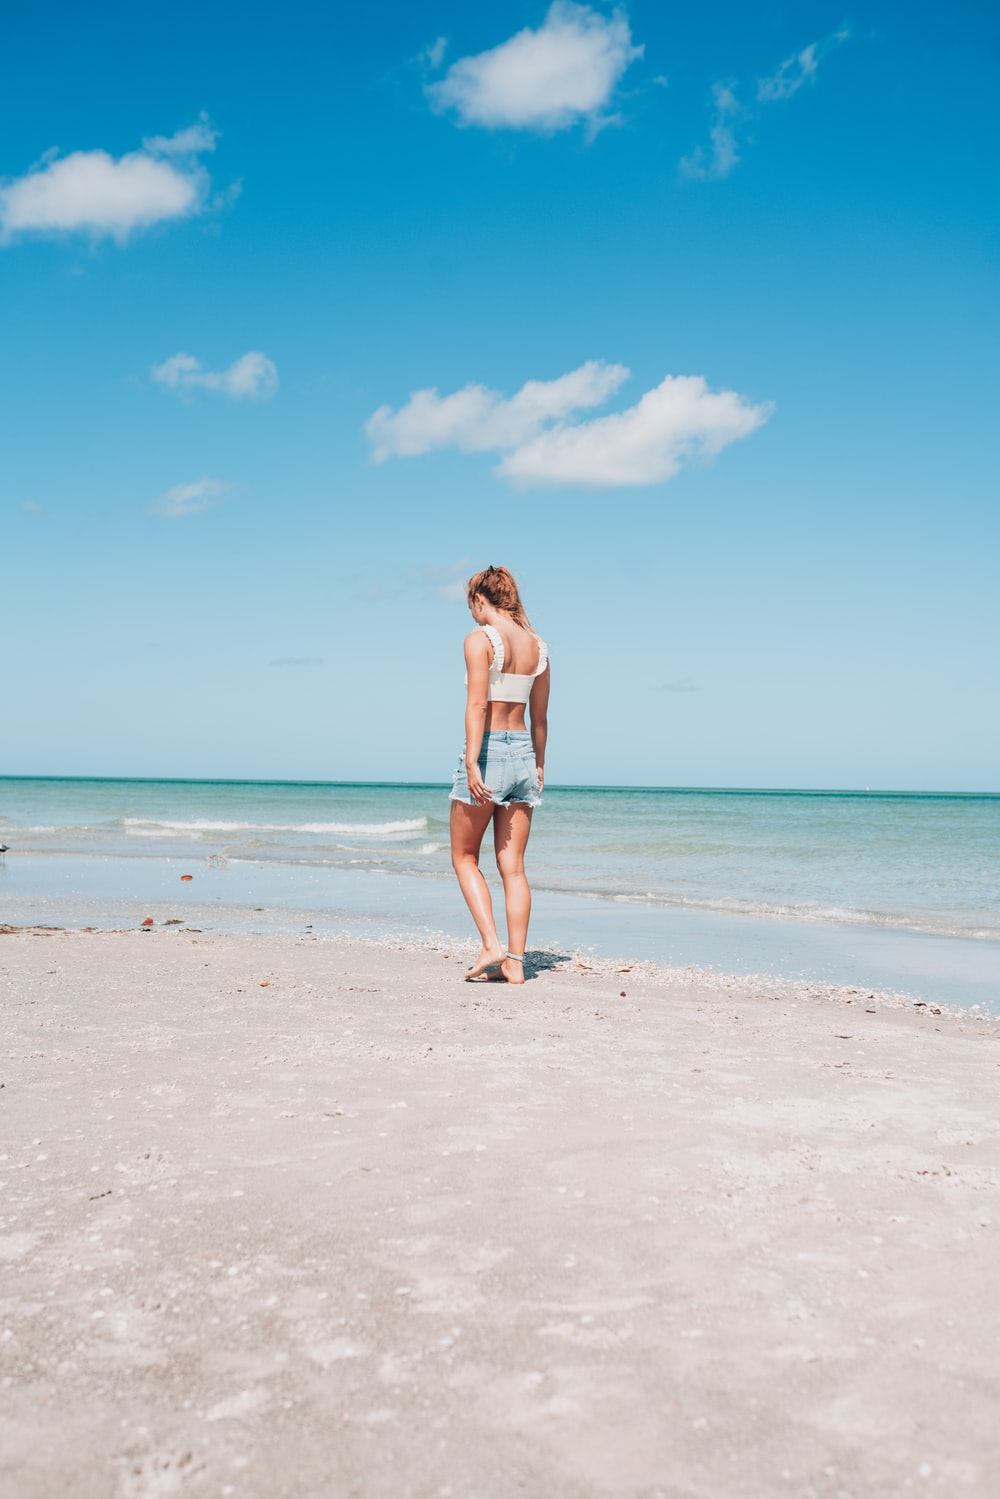 woman in blue bikini standing on beach during daytime